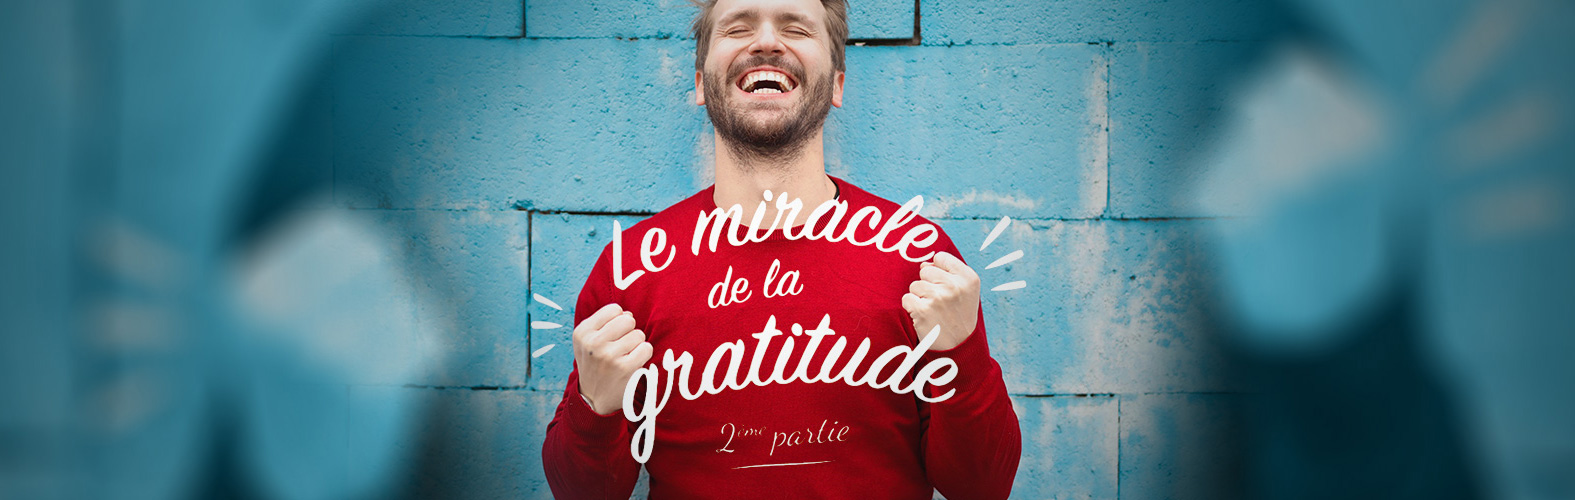 gratitude-background-2020-small